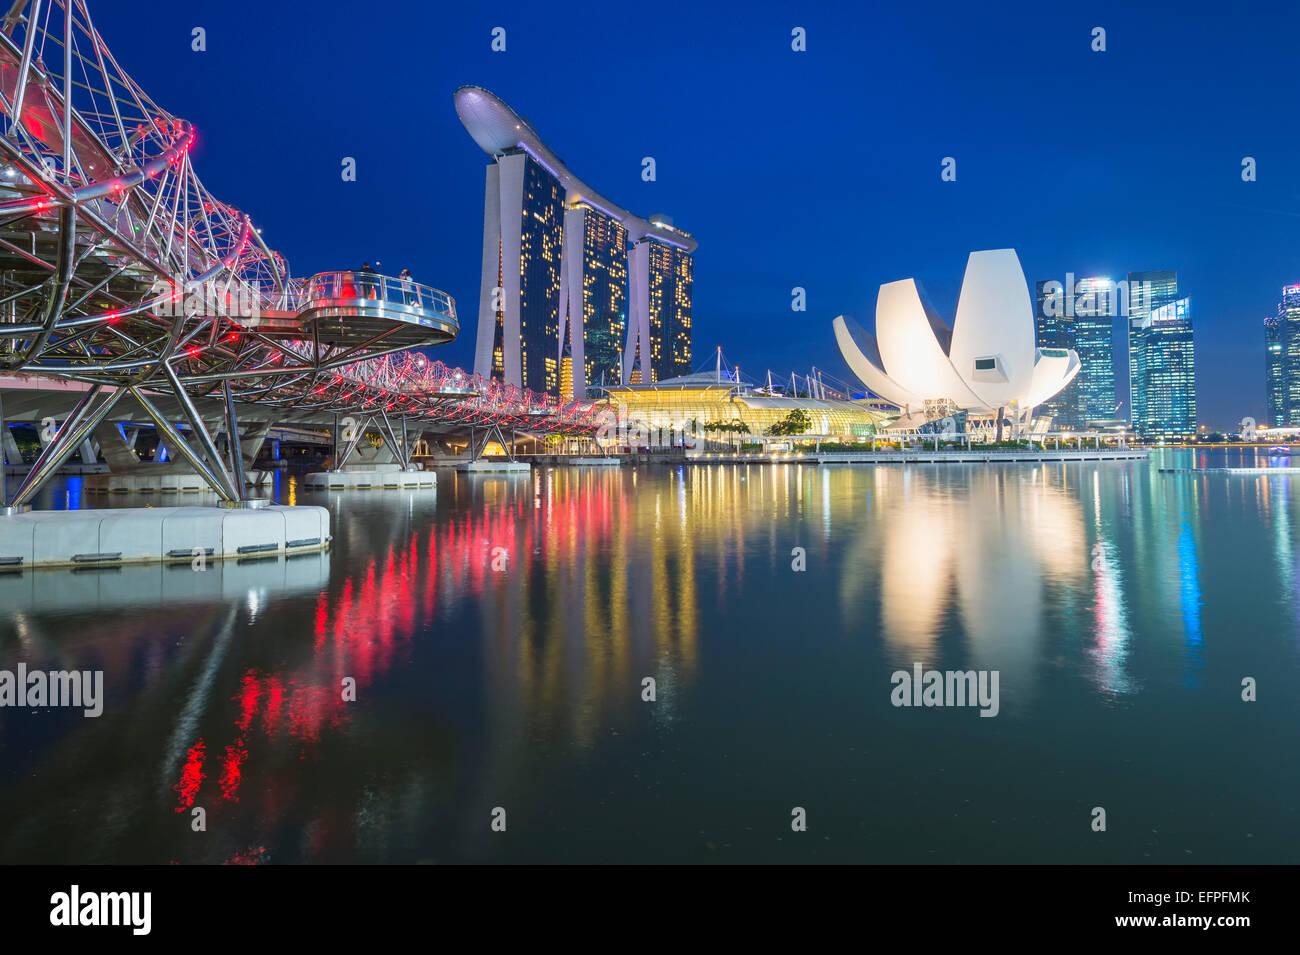 Marina Bay at night, Singapore, Southeast Asia, Asia - Stock Image